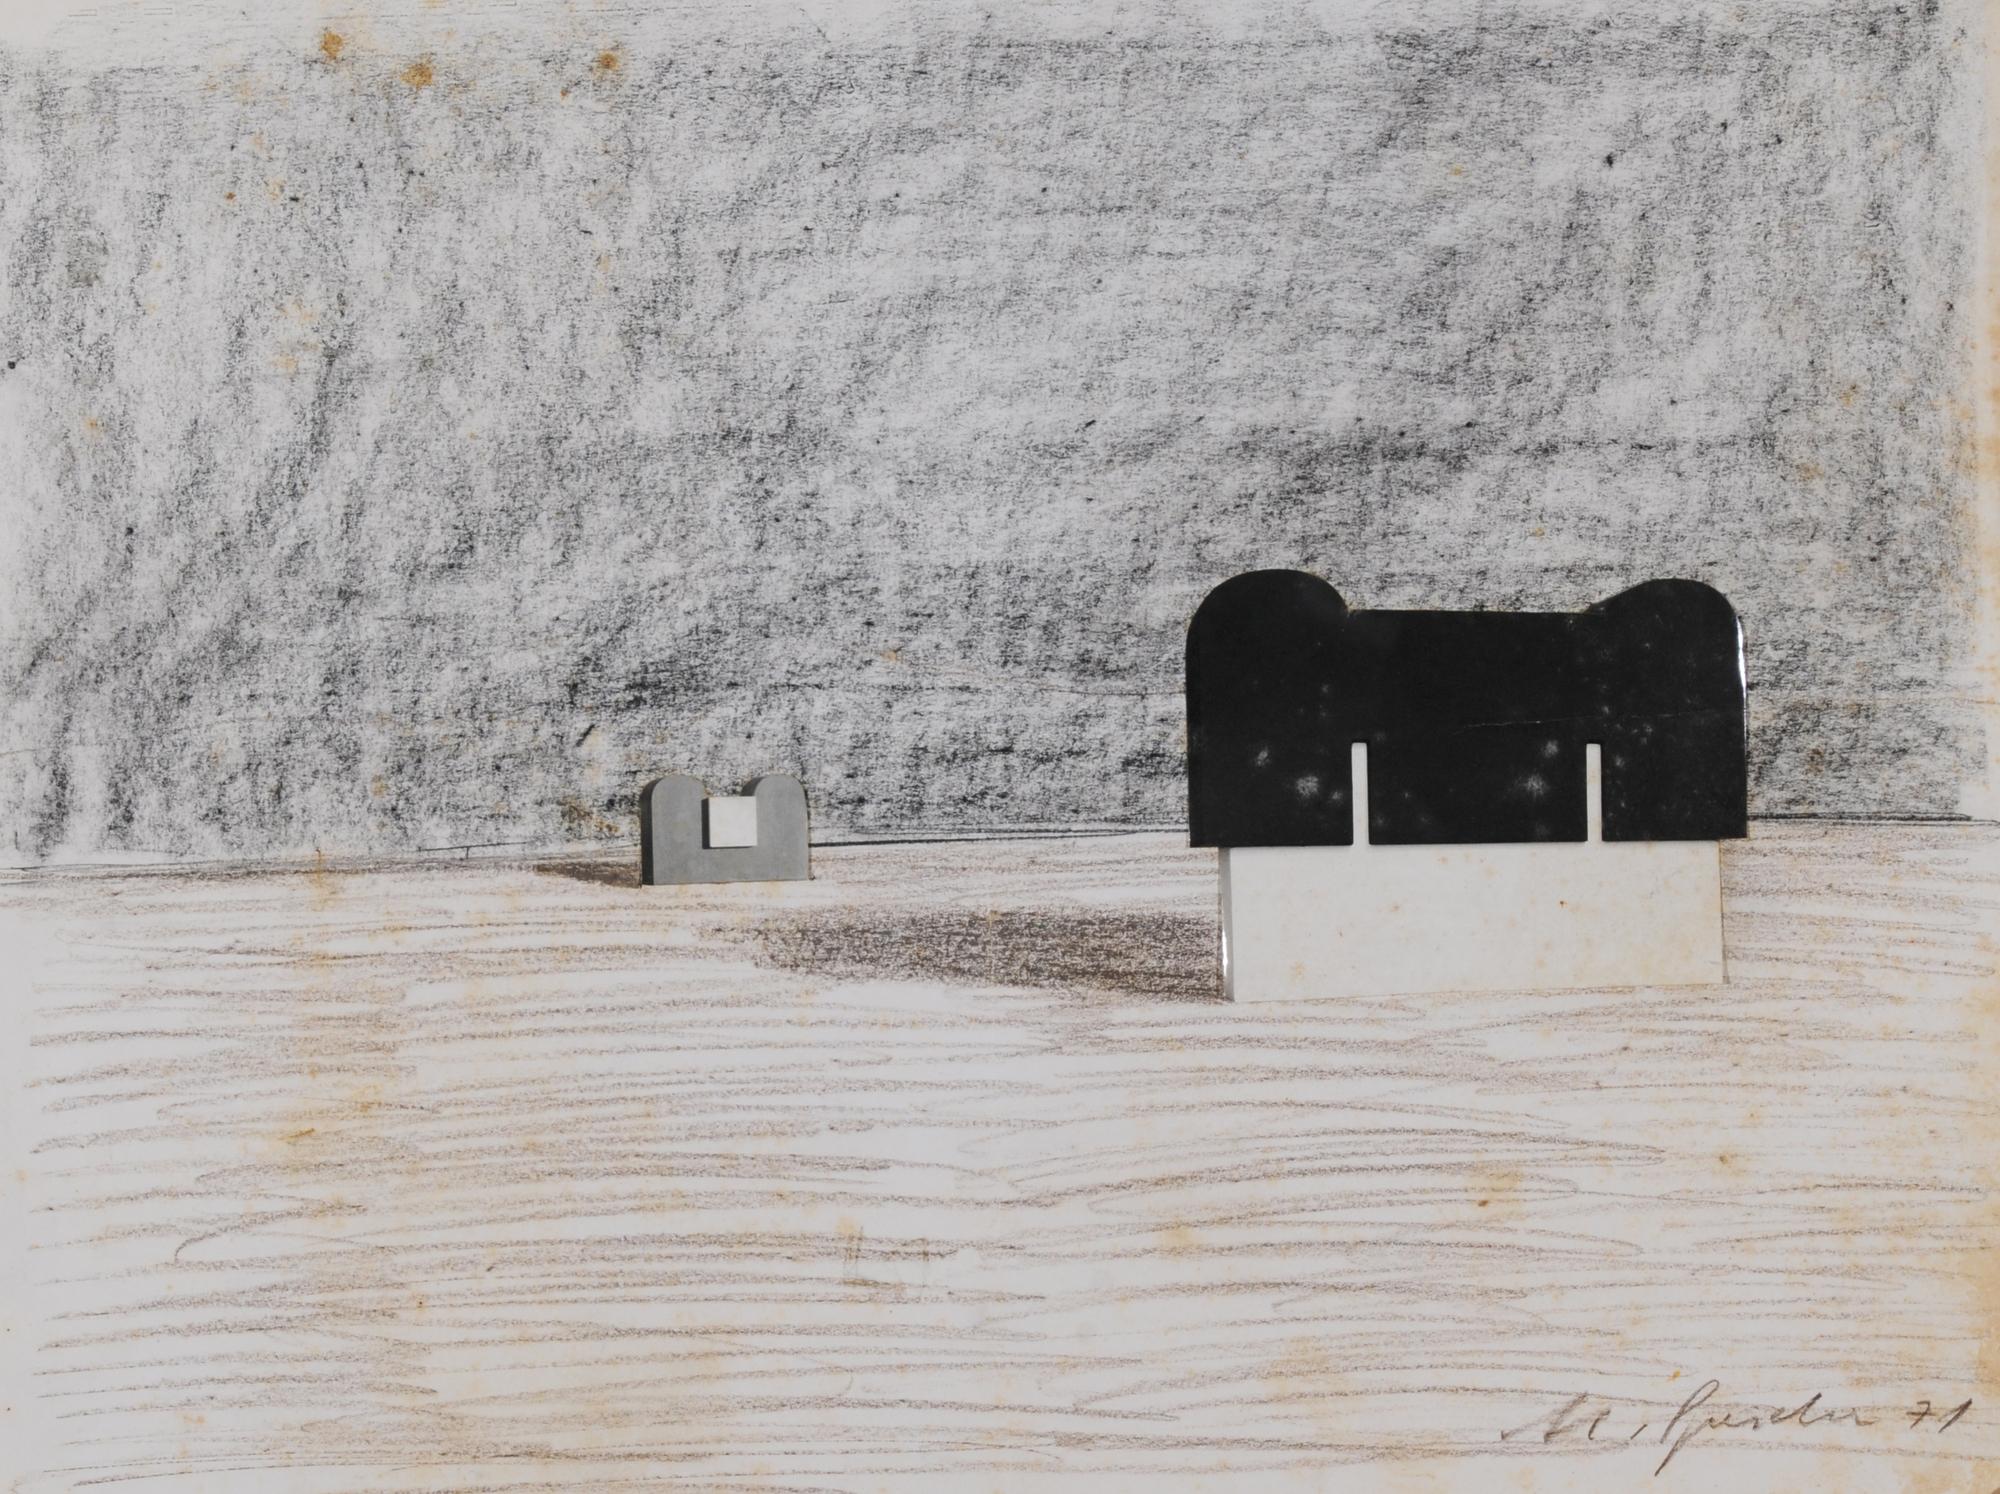 Spescha Matias, Entwurf (Study)